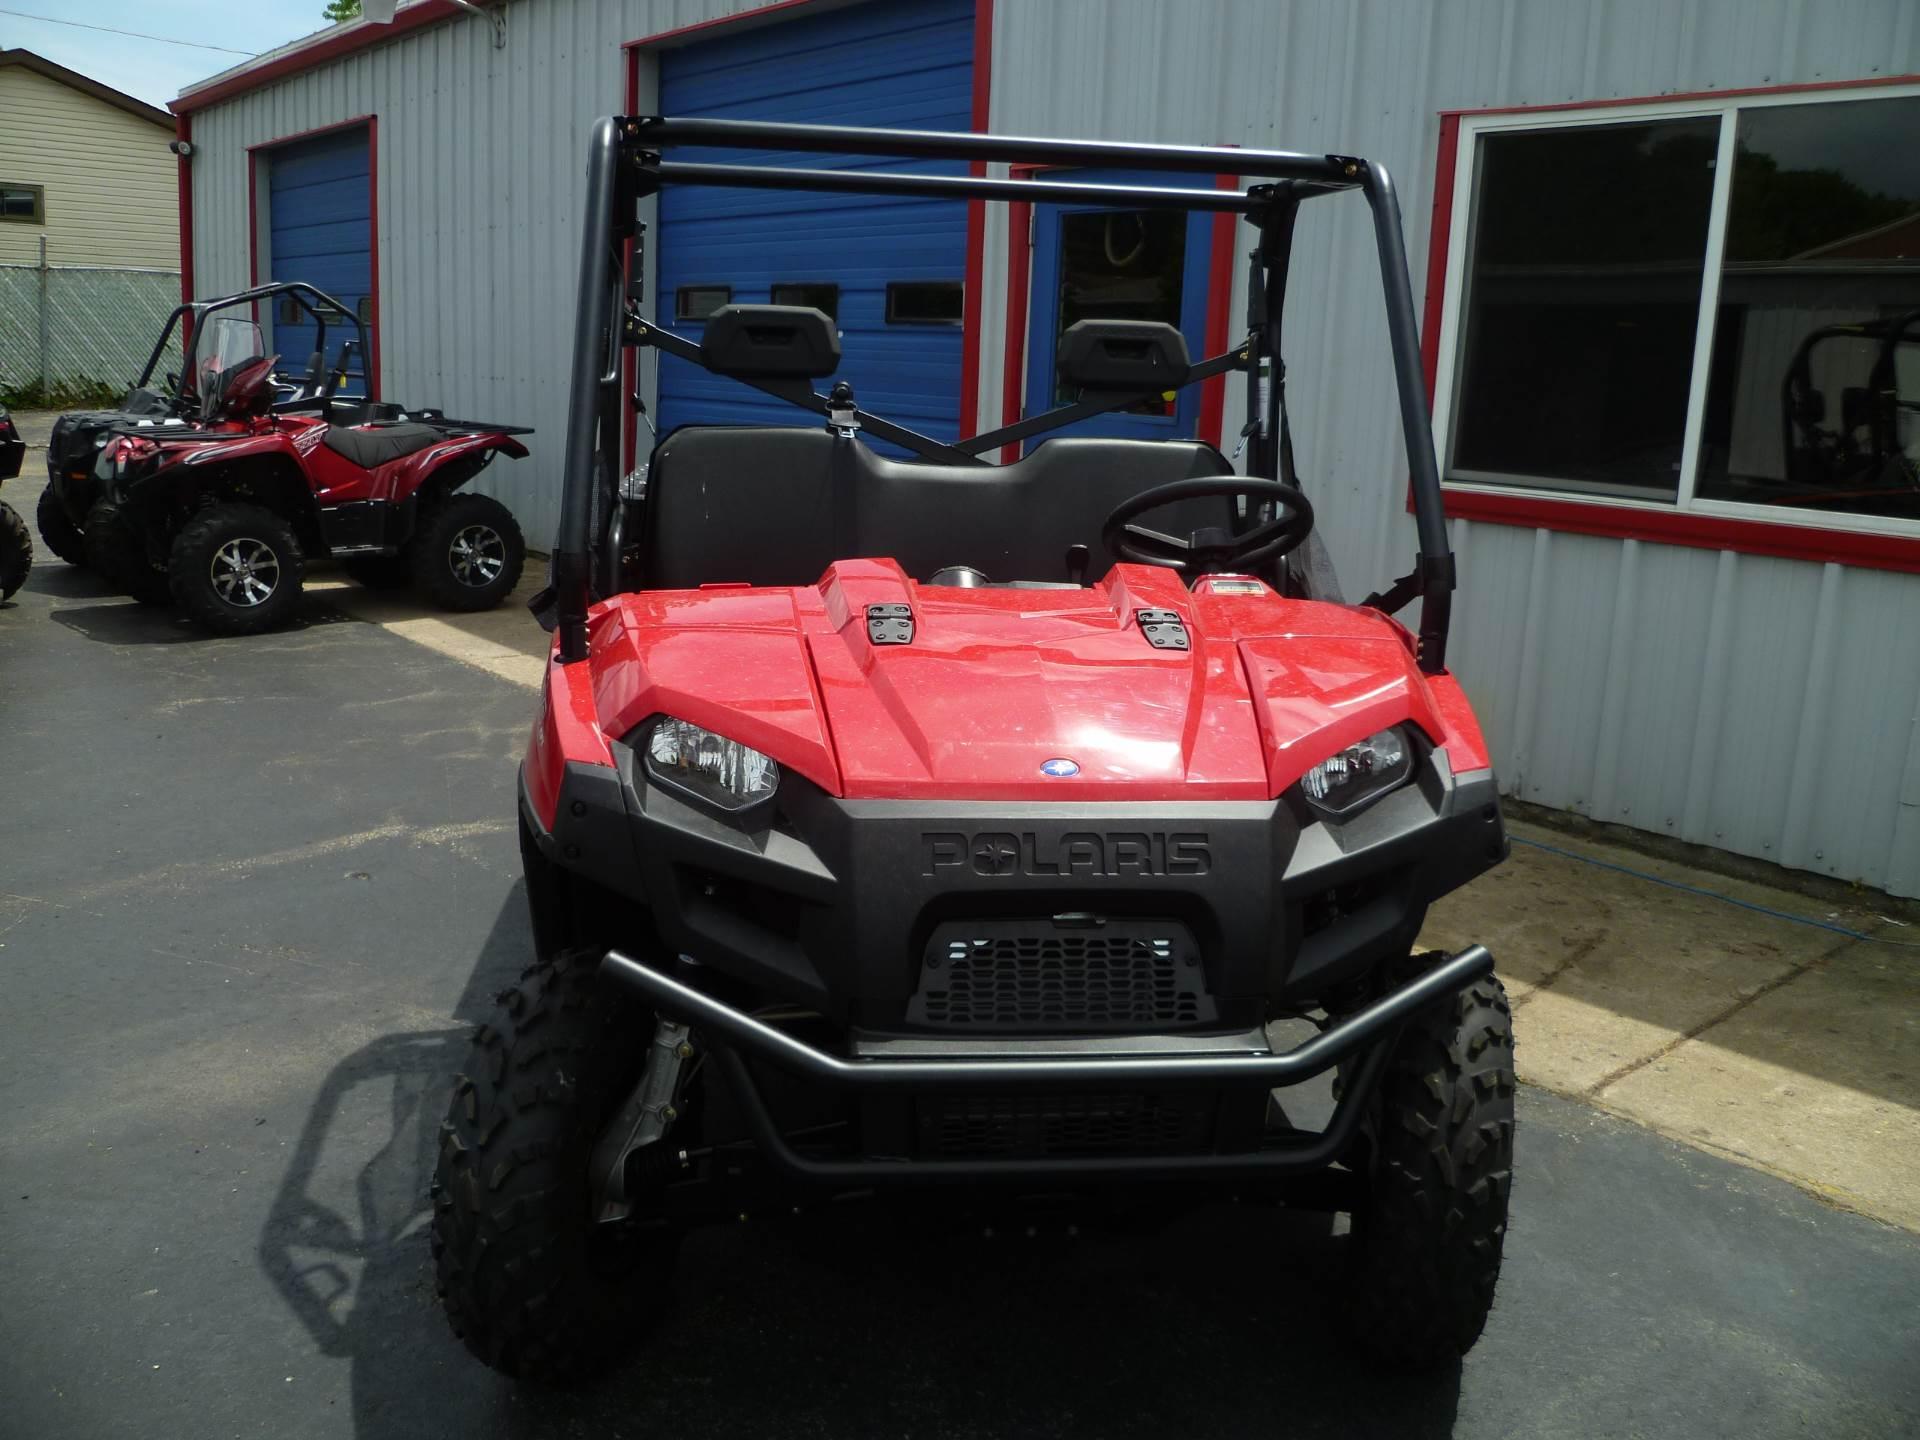 2016 Polaris Ranger570 Full Size 3